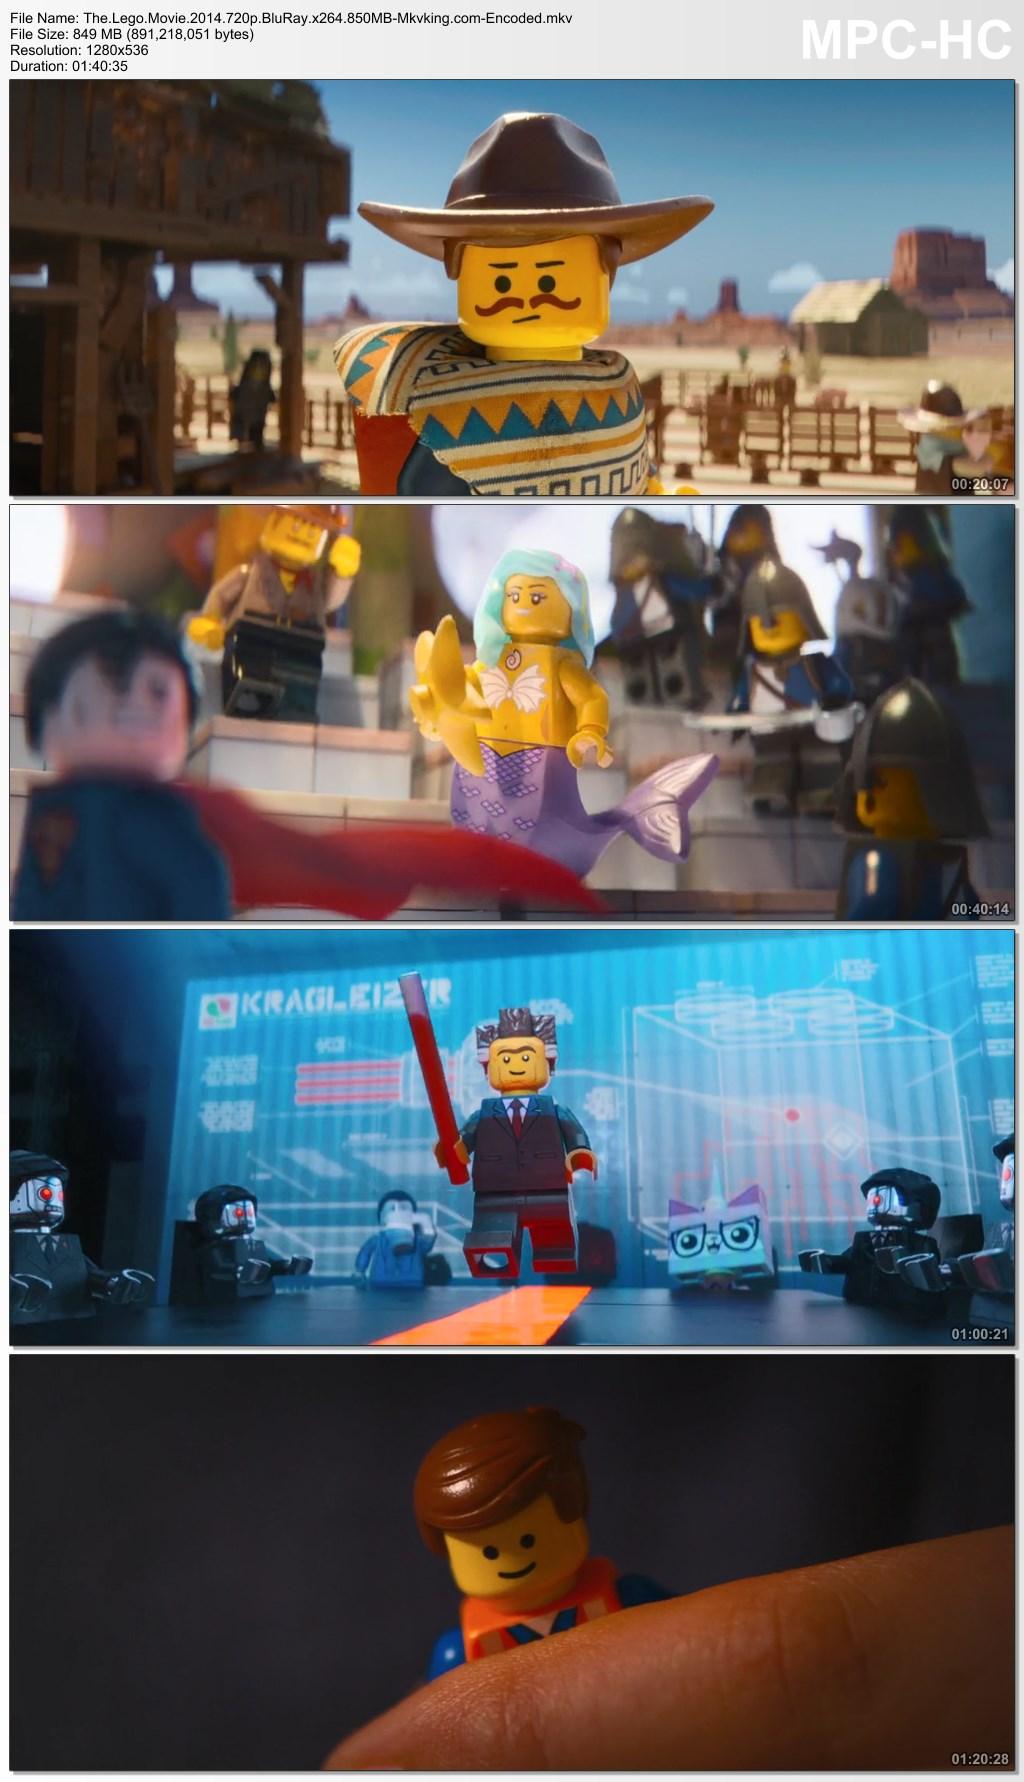 The Lego Movie 2014 720p Blu Ray X264 850 Mb Mkvking Com Encoded Mkv Thumbs 2019 04 26 06 38 39 Imgbb